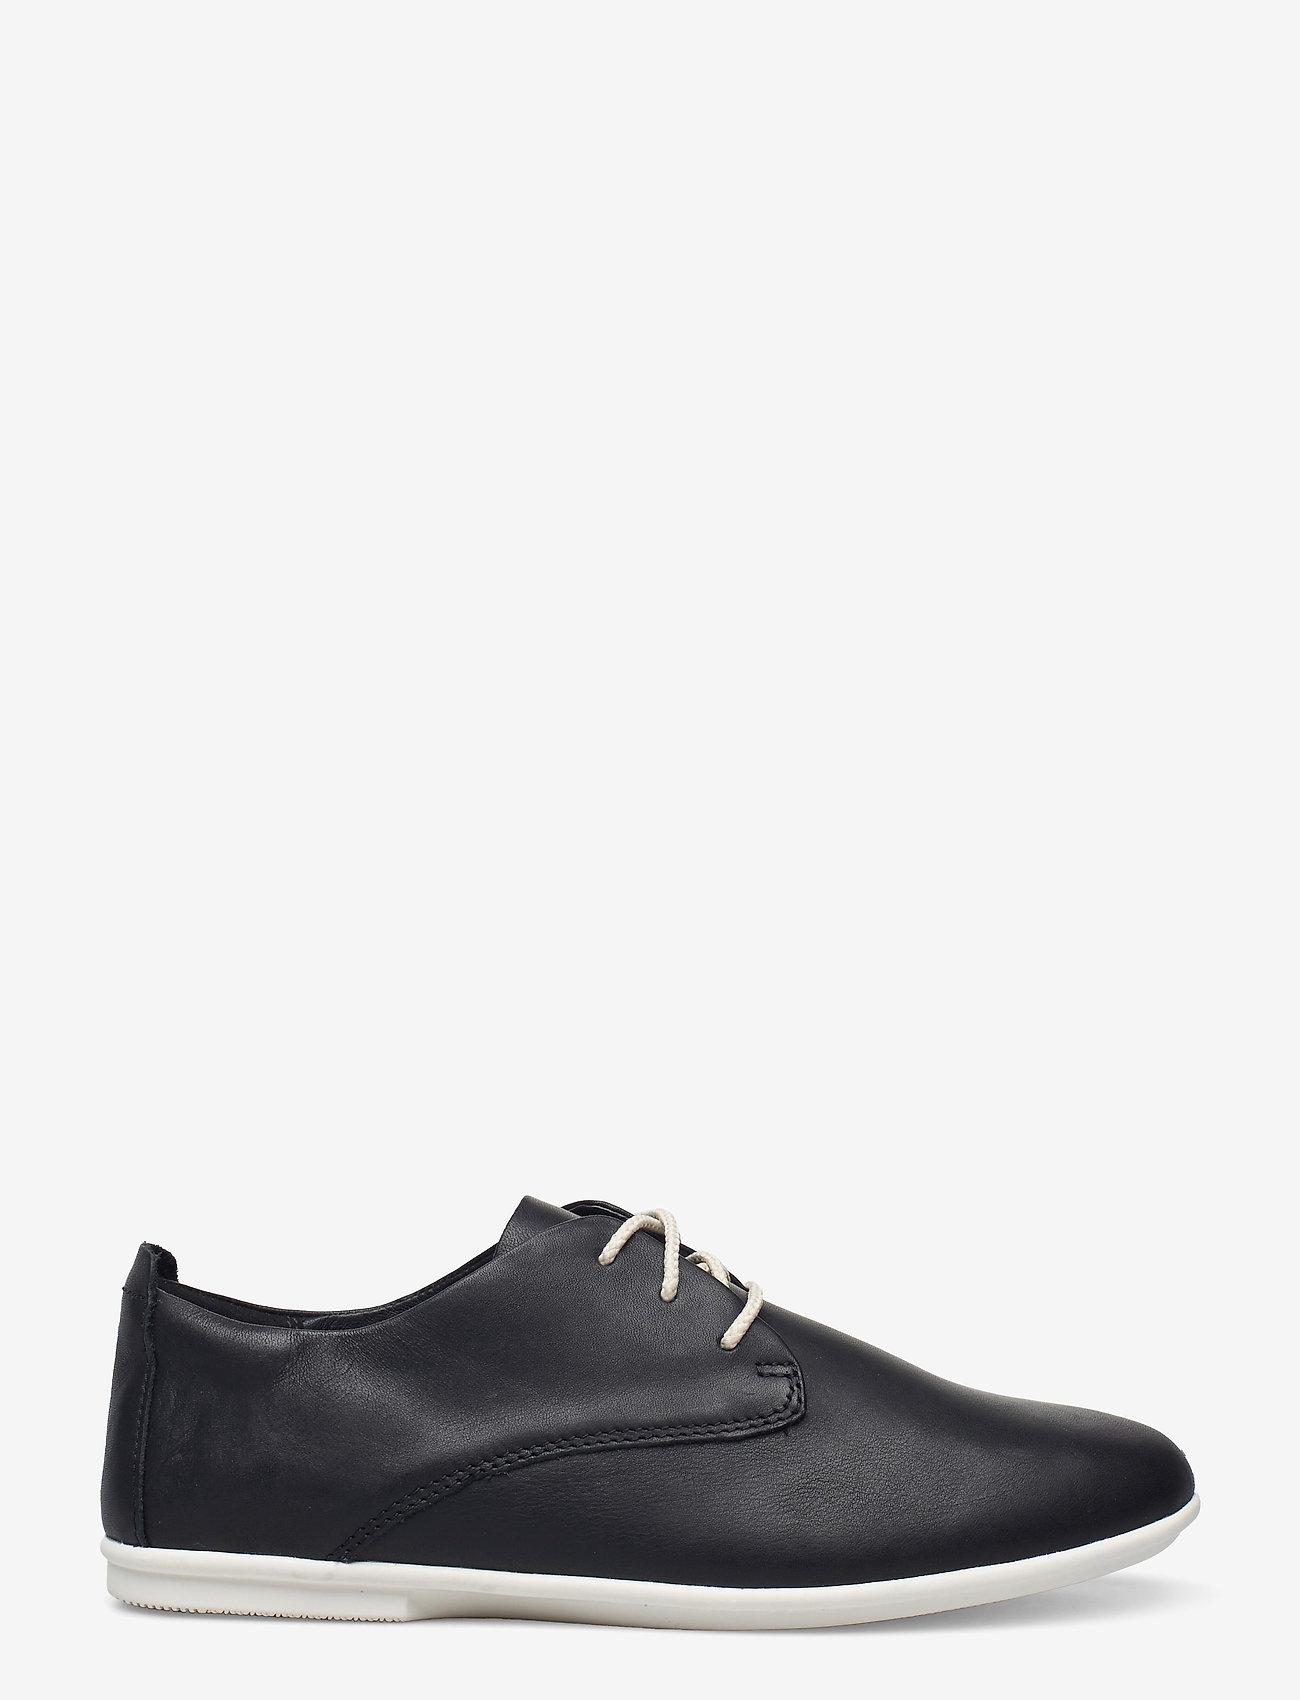 Clarks - Un Coral Lace - snörskor - black leather - 1